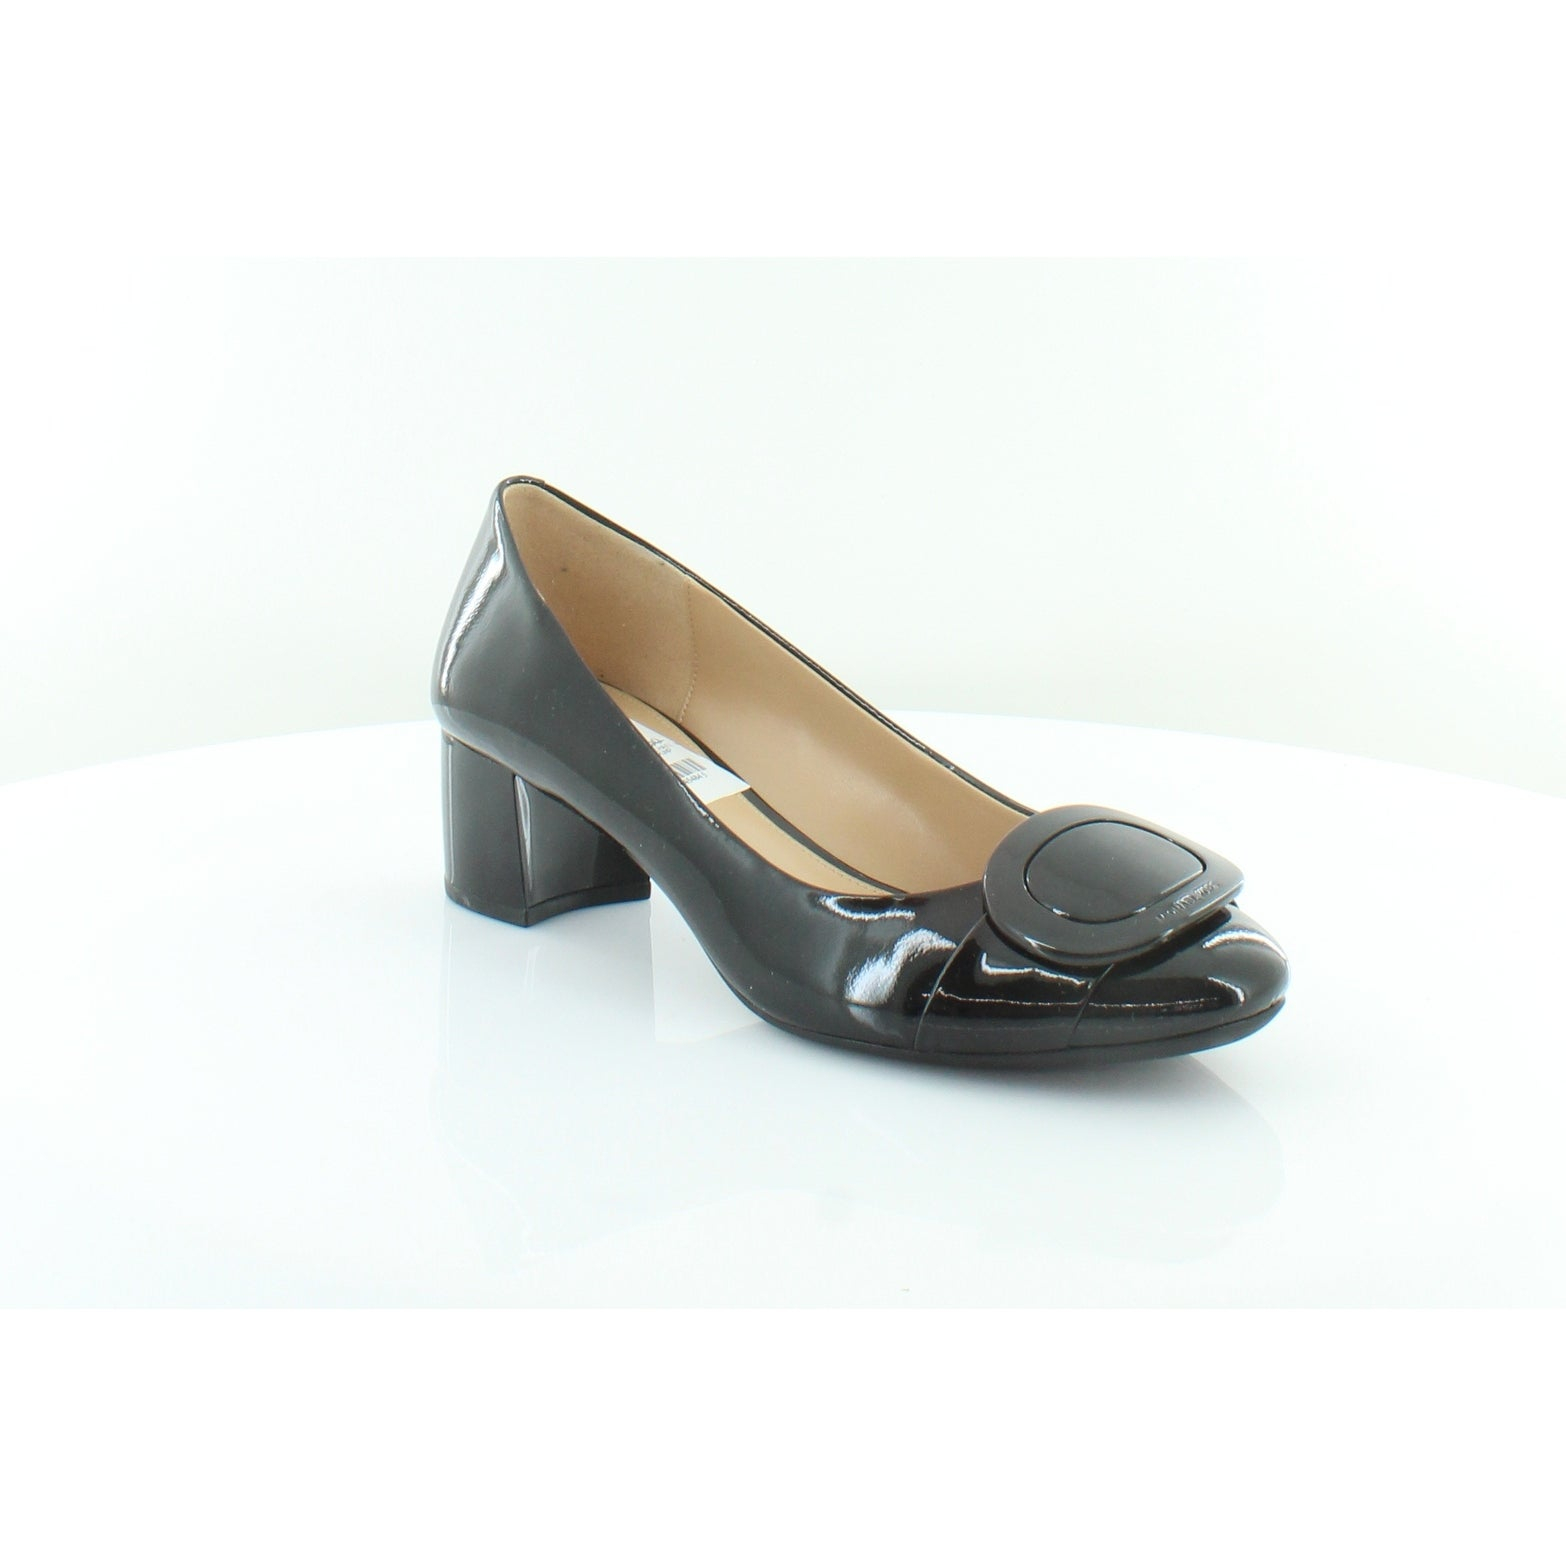 cfabdf9cf2d Black Michael Kors Women s Shoes